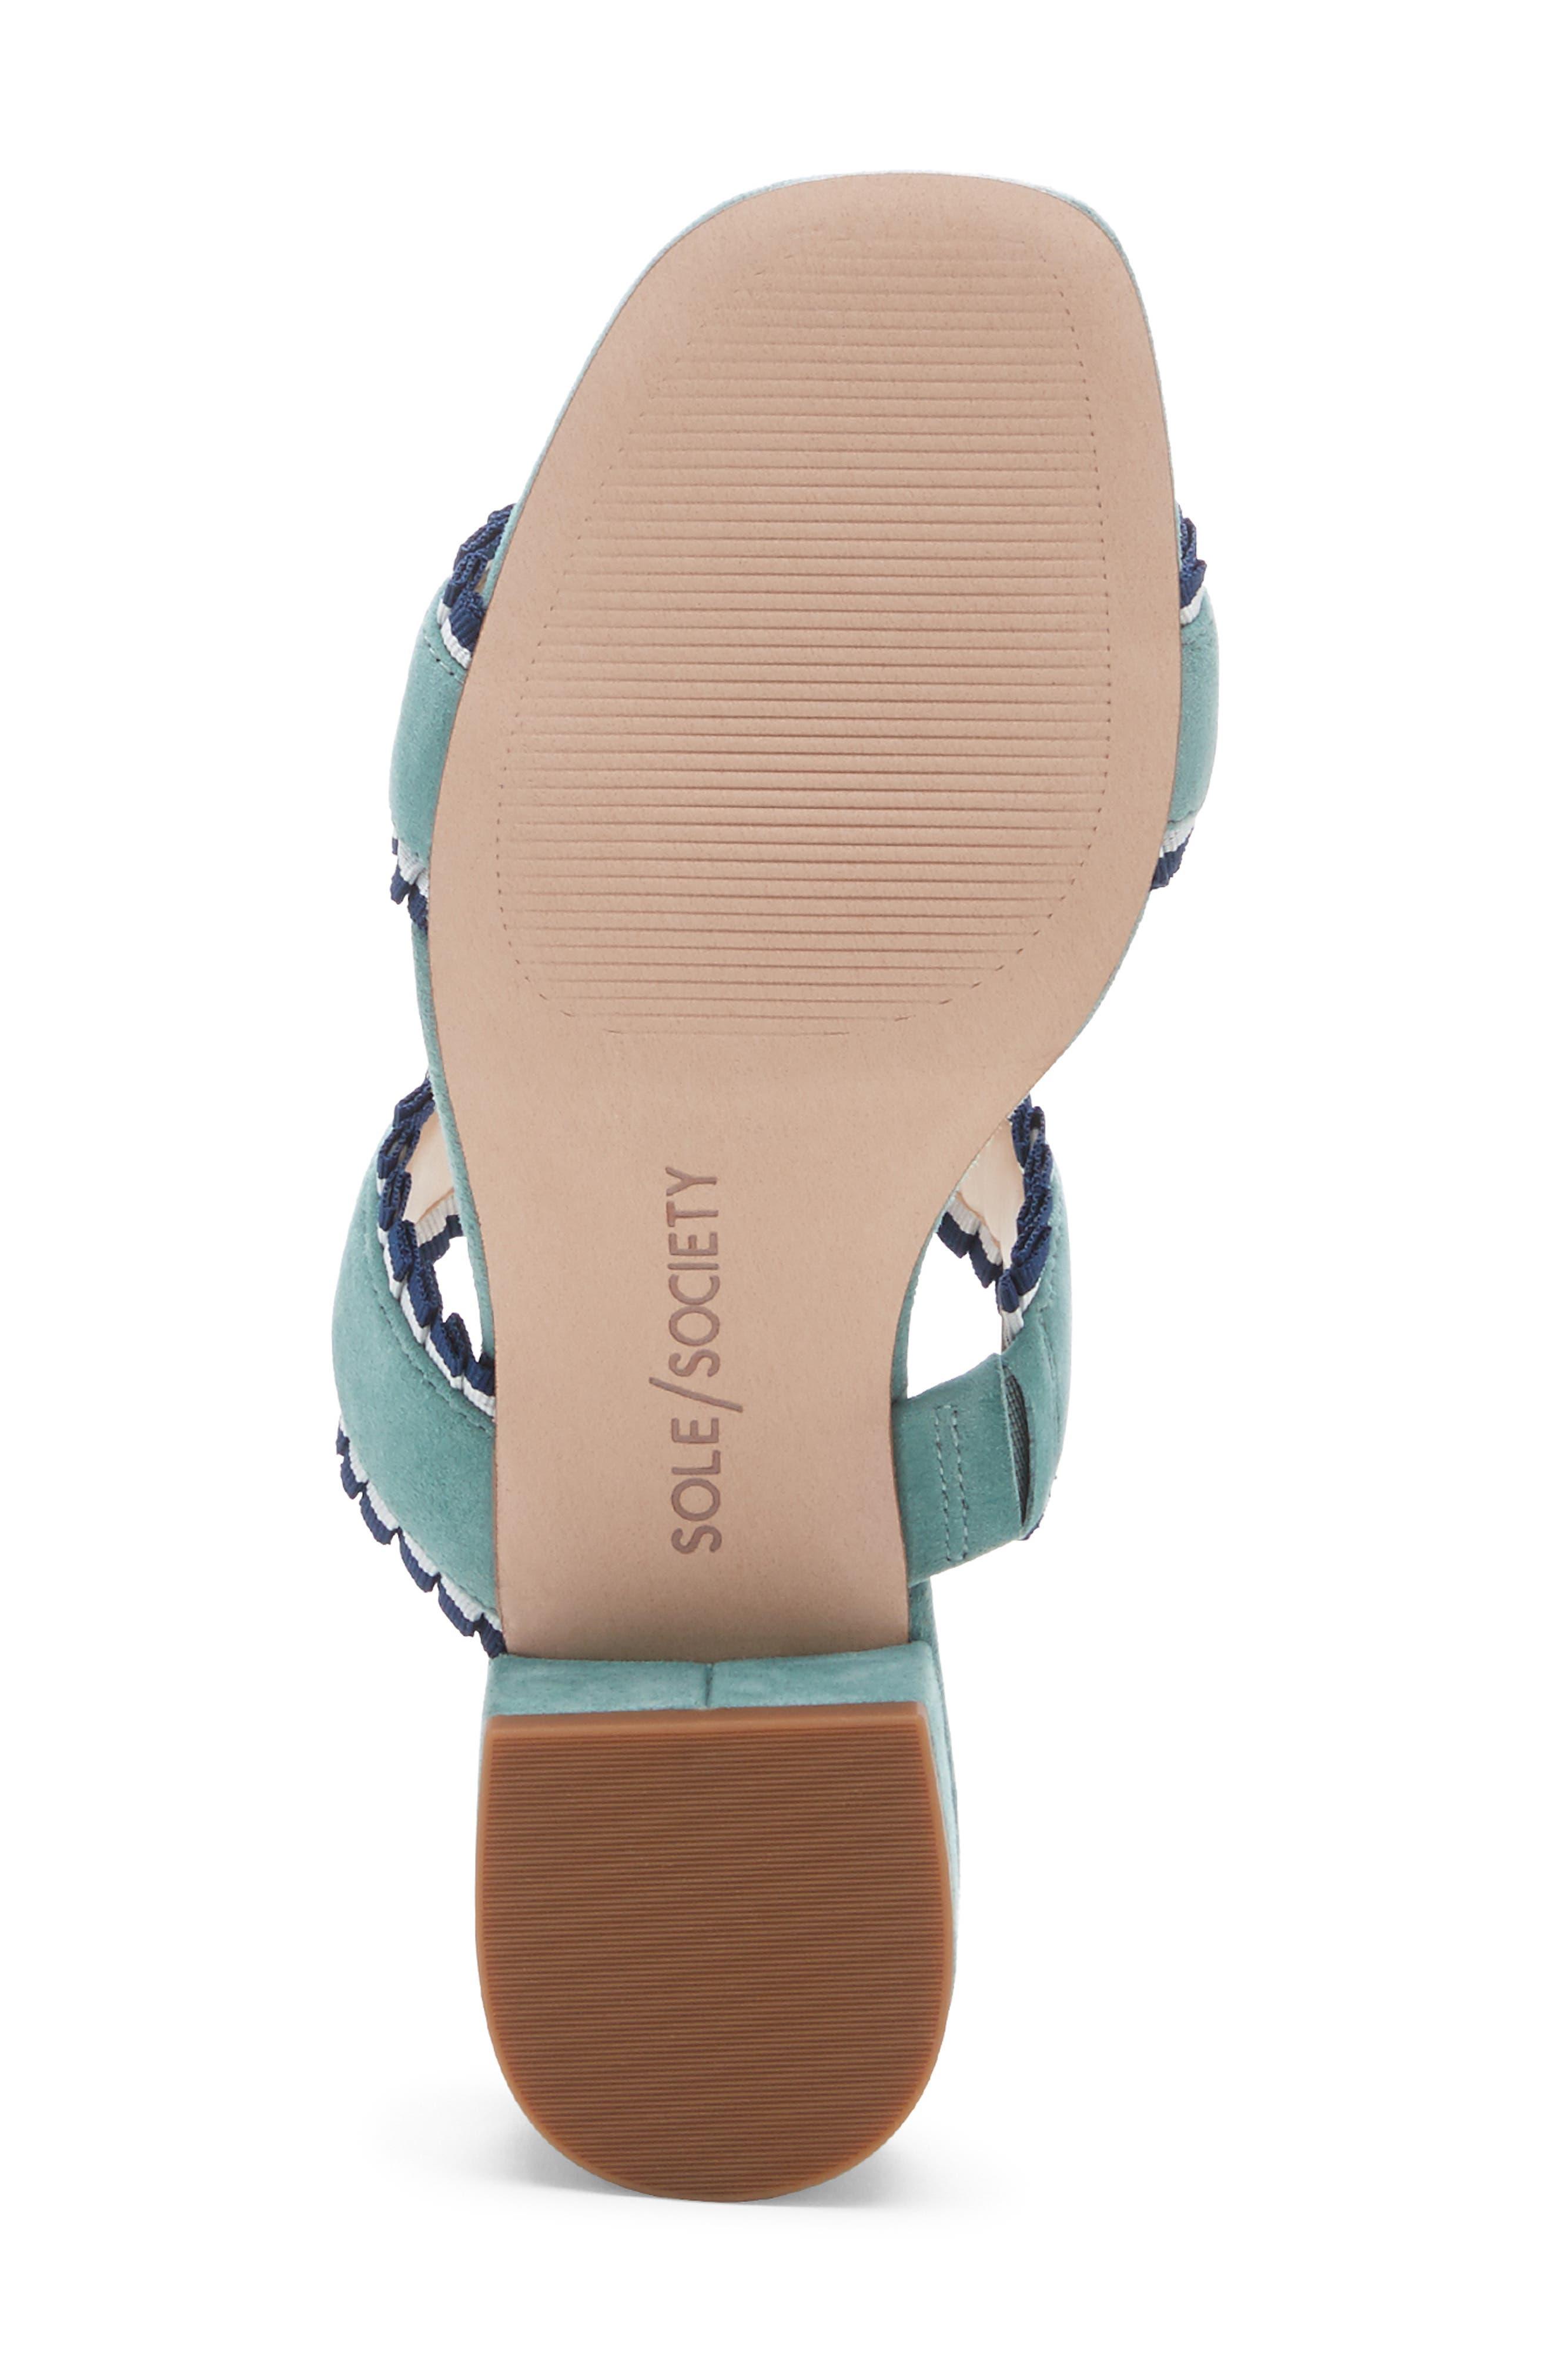 SOLE SOCIETY,                             Elura Slide Sandal,                             Alternate thumbnail 6, color,                             LIGHT SEA GREEN SUEDE